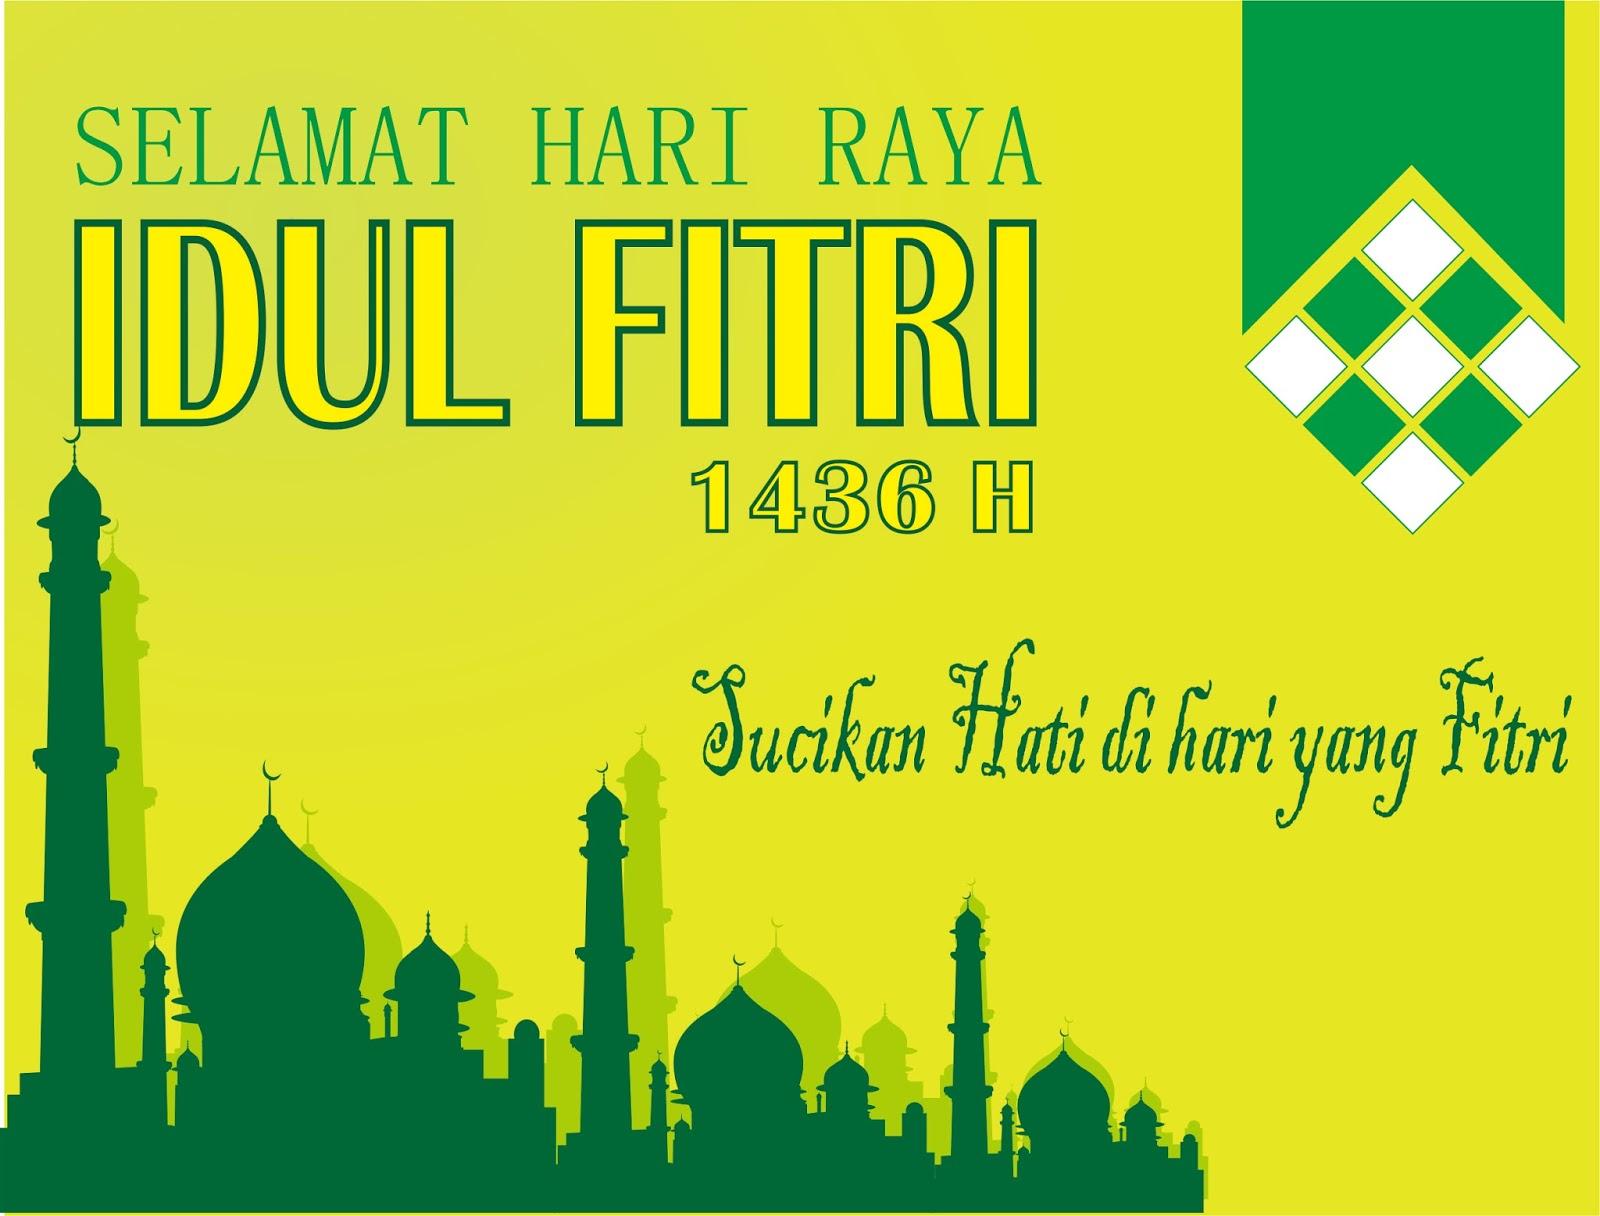 Kartu Ucapan Selamat Idul Fitri Cdr Frasmi